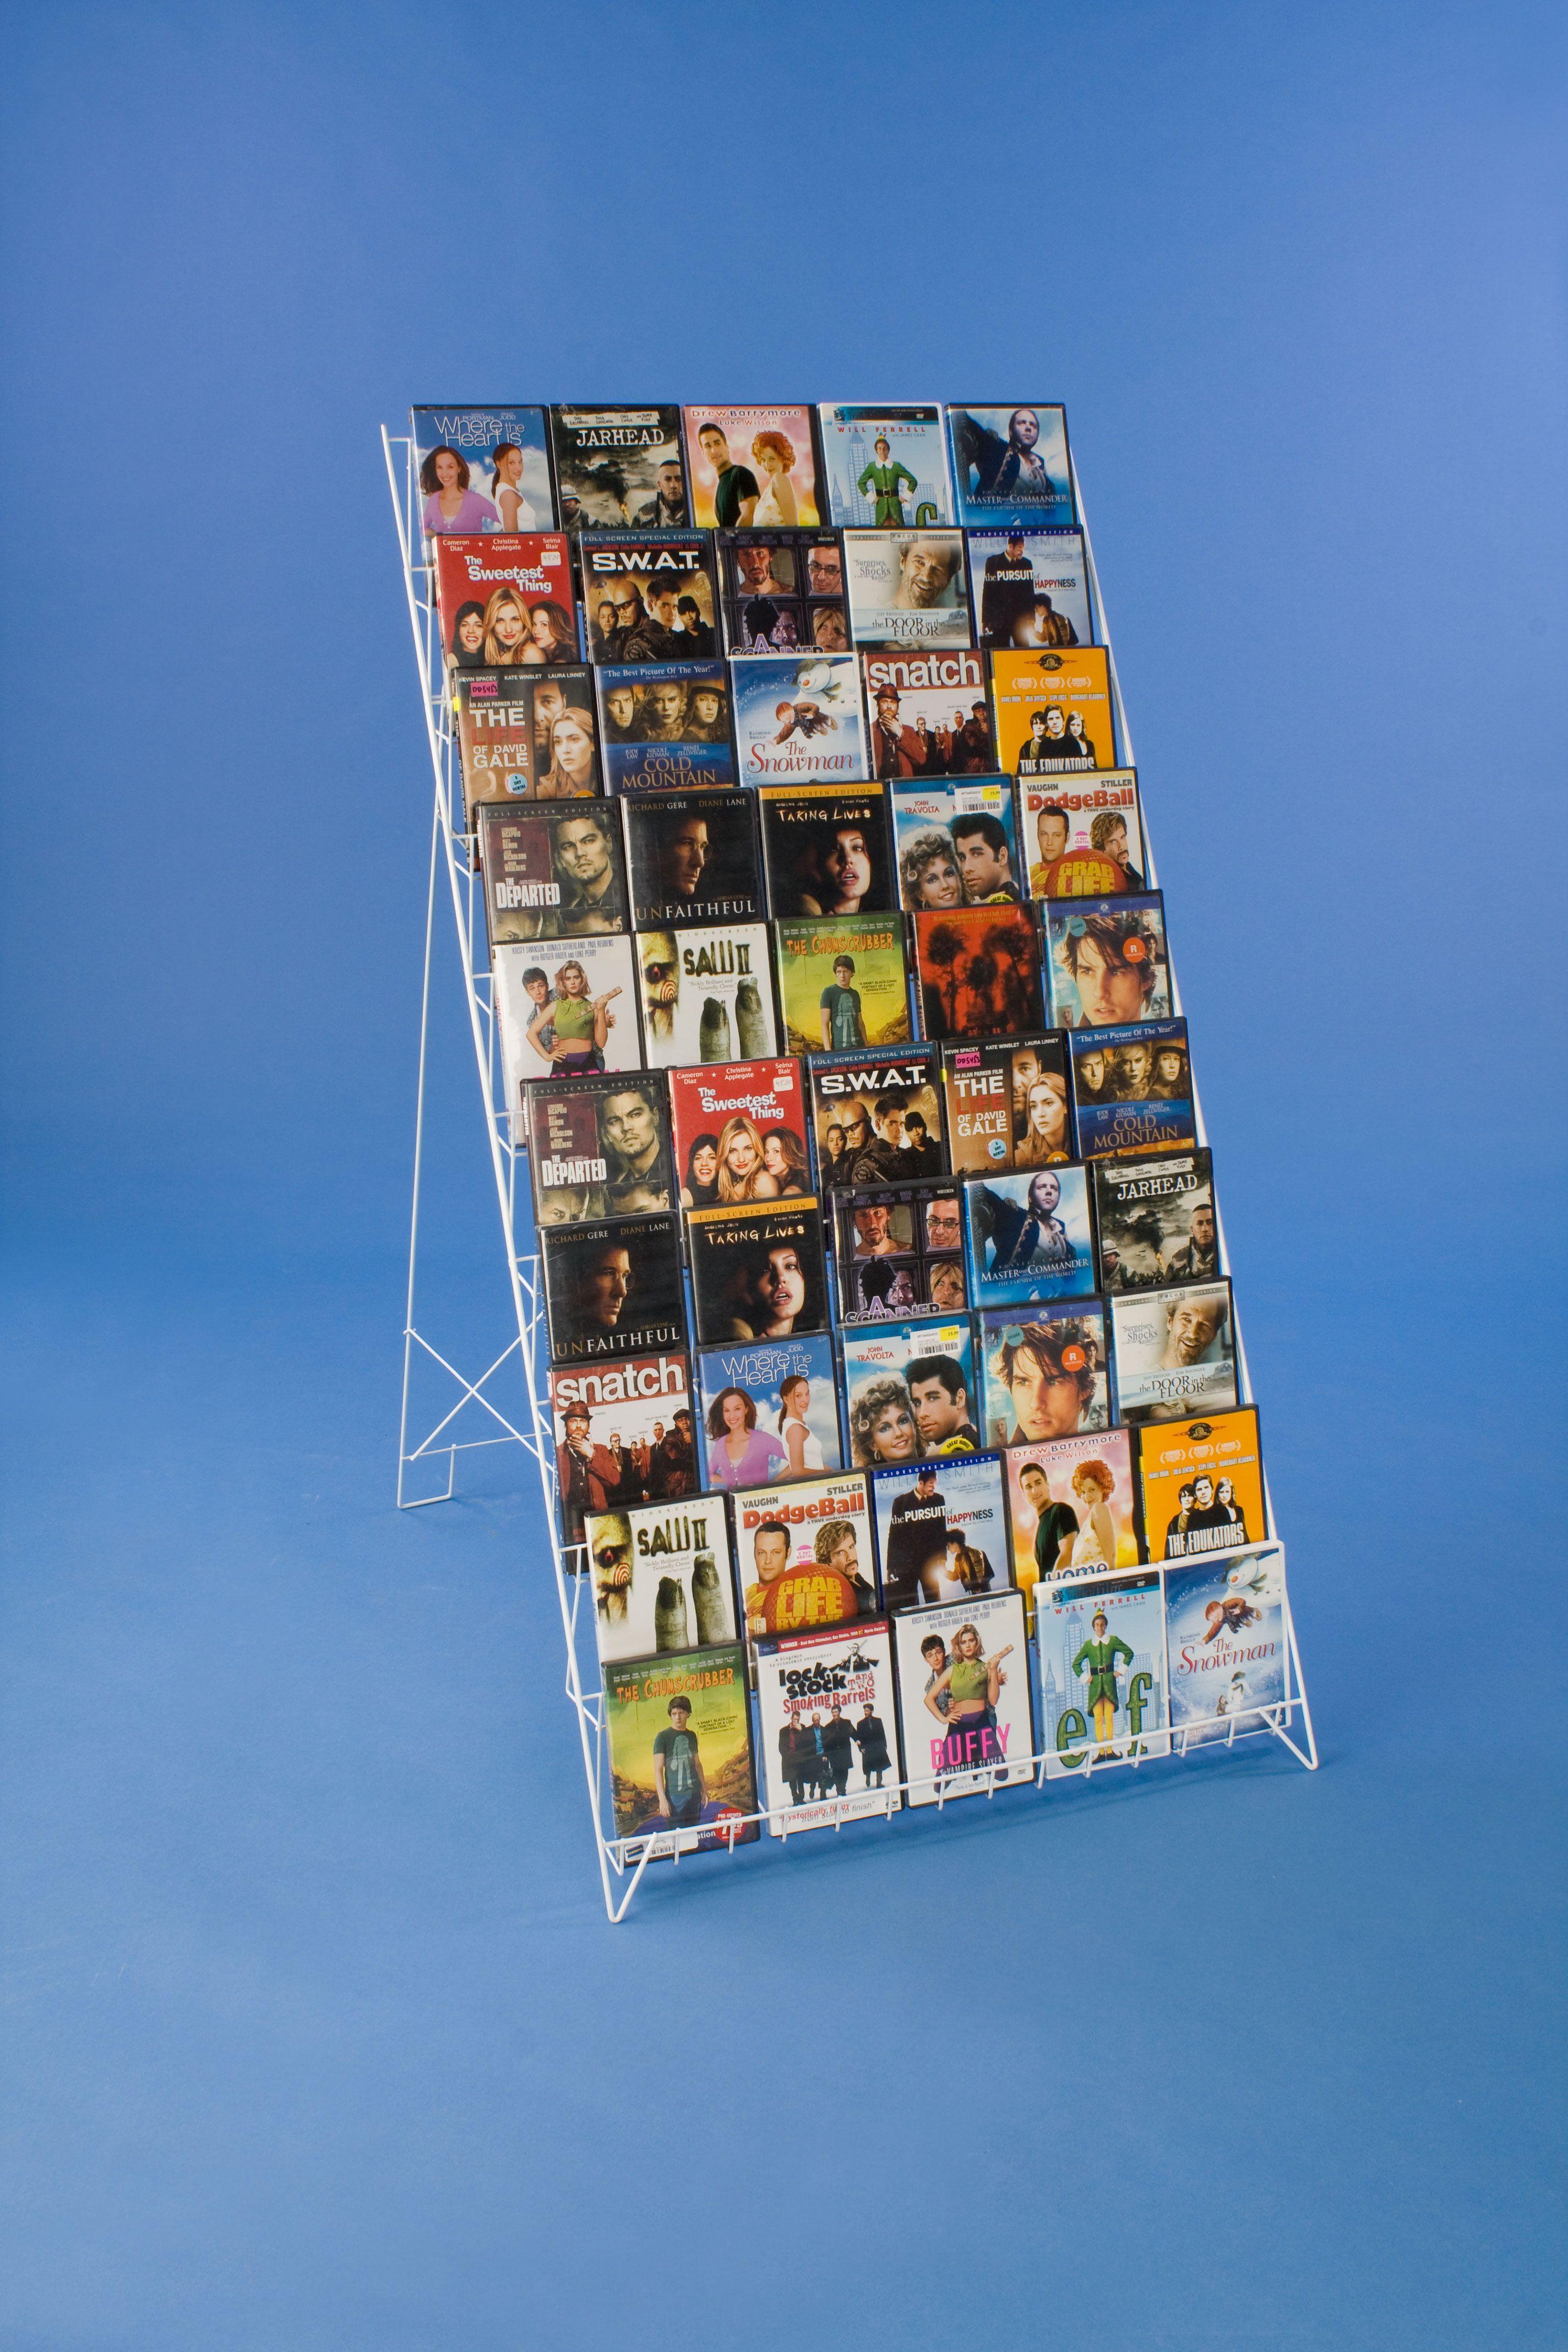 10 Tiered Wire Literature Floor Stand 4 8 5 W Open Shelves Header White Book Display Stand Magazine Display Rack Comic Book Storage